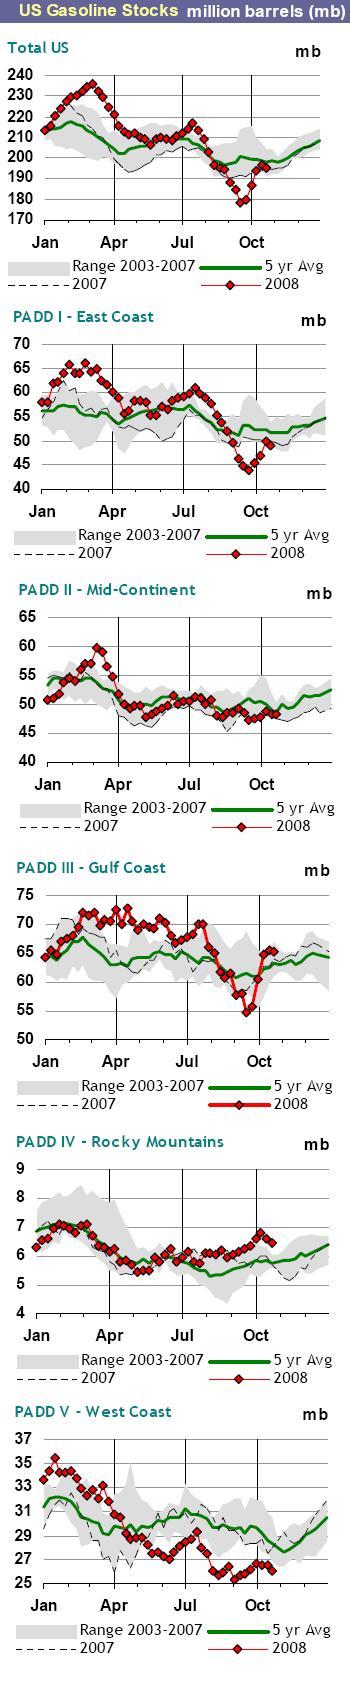 Gasoline Stocks - BNP Paribas